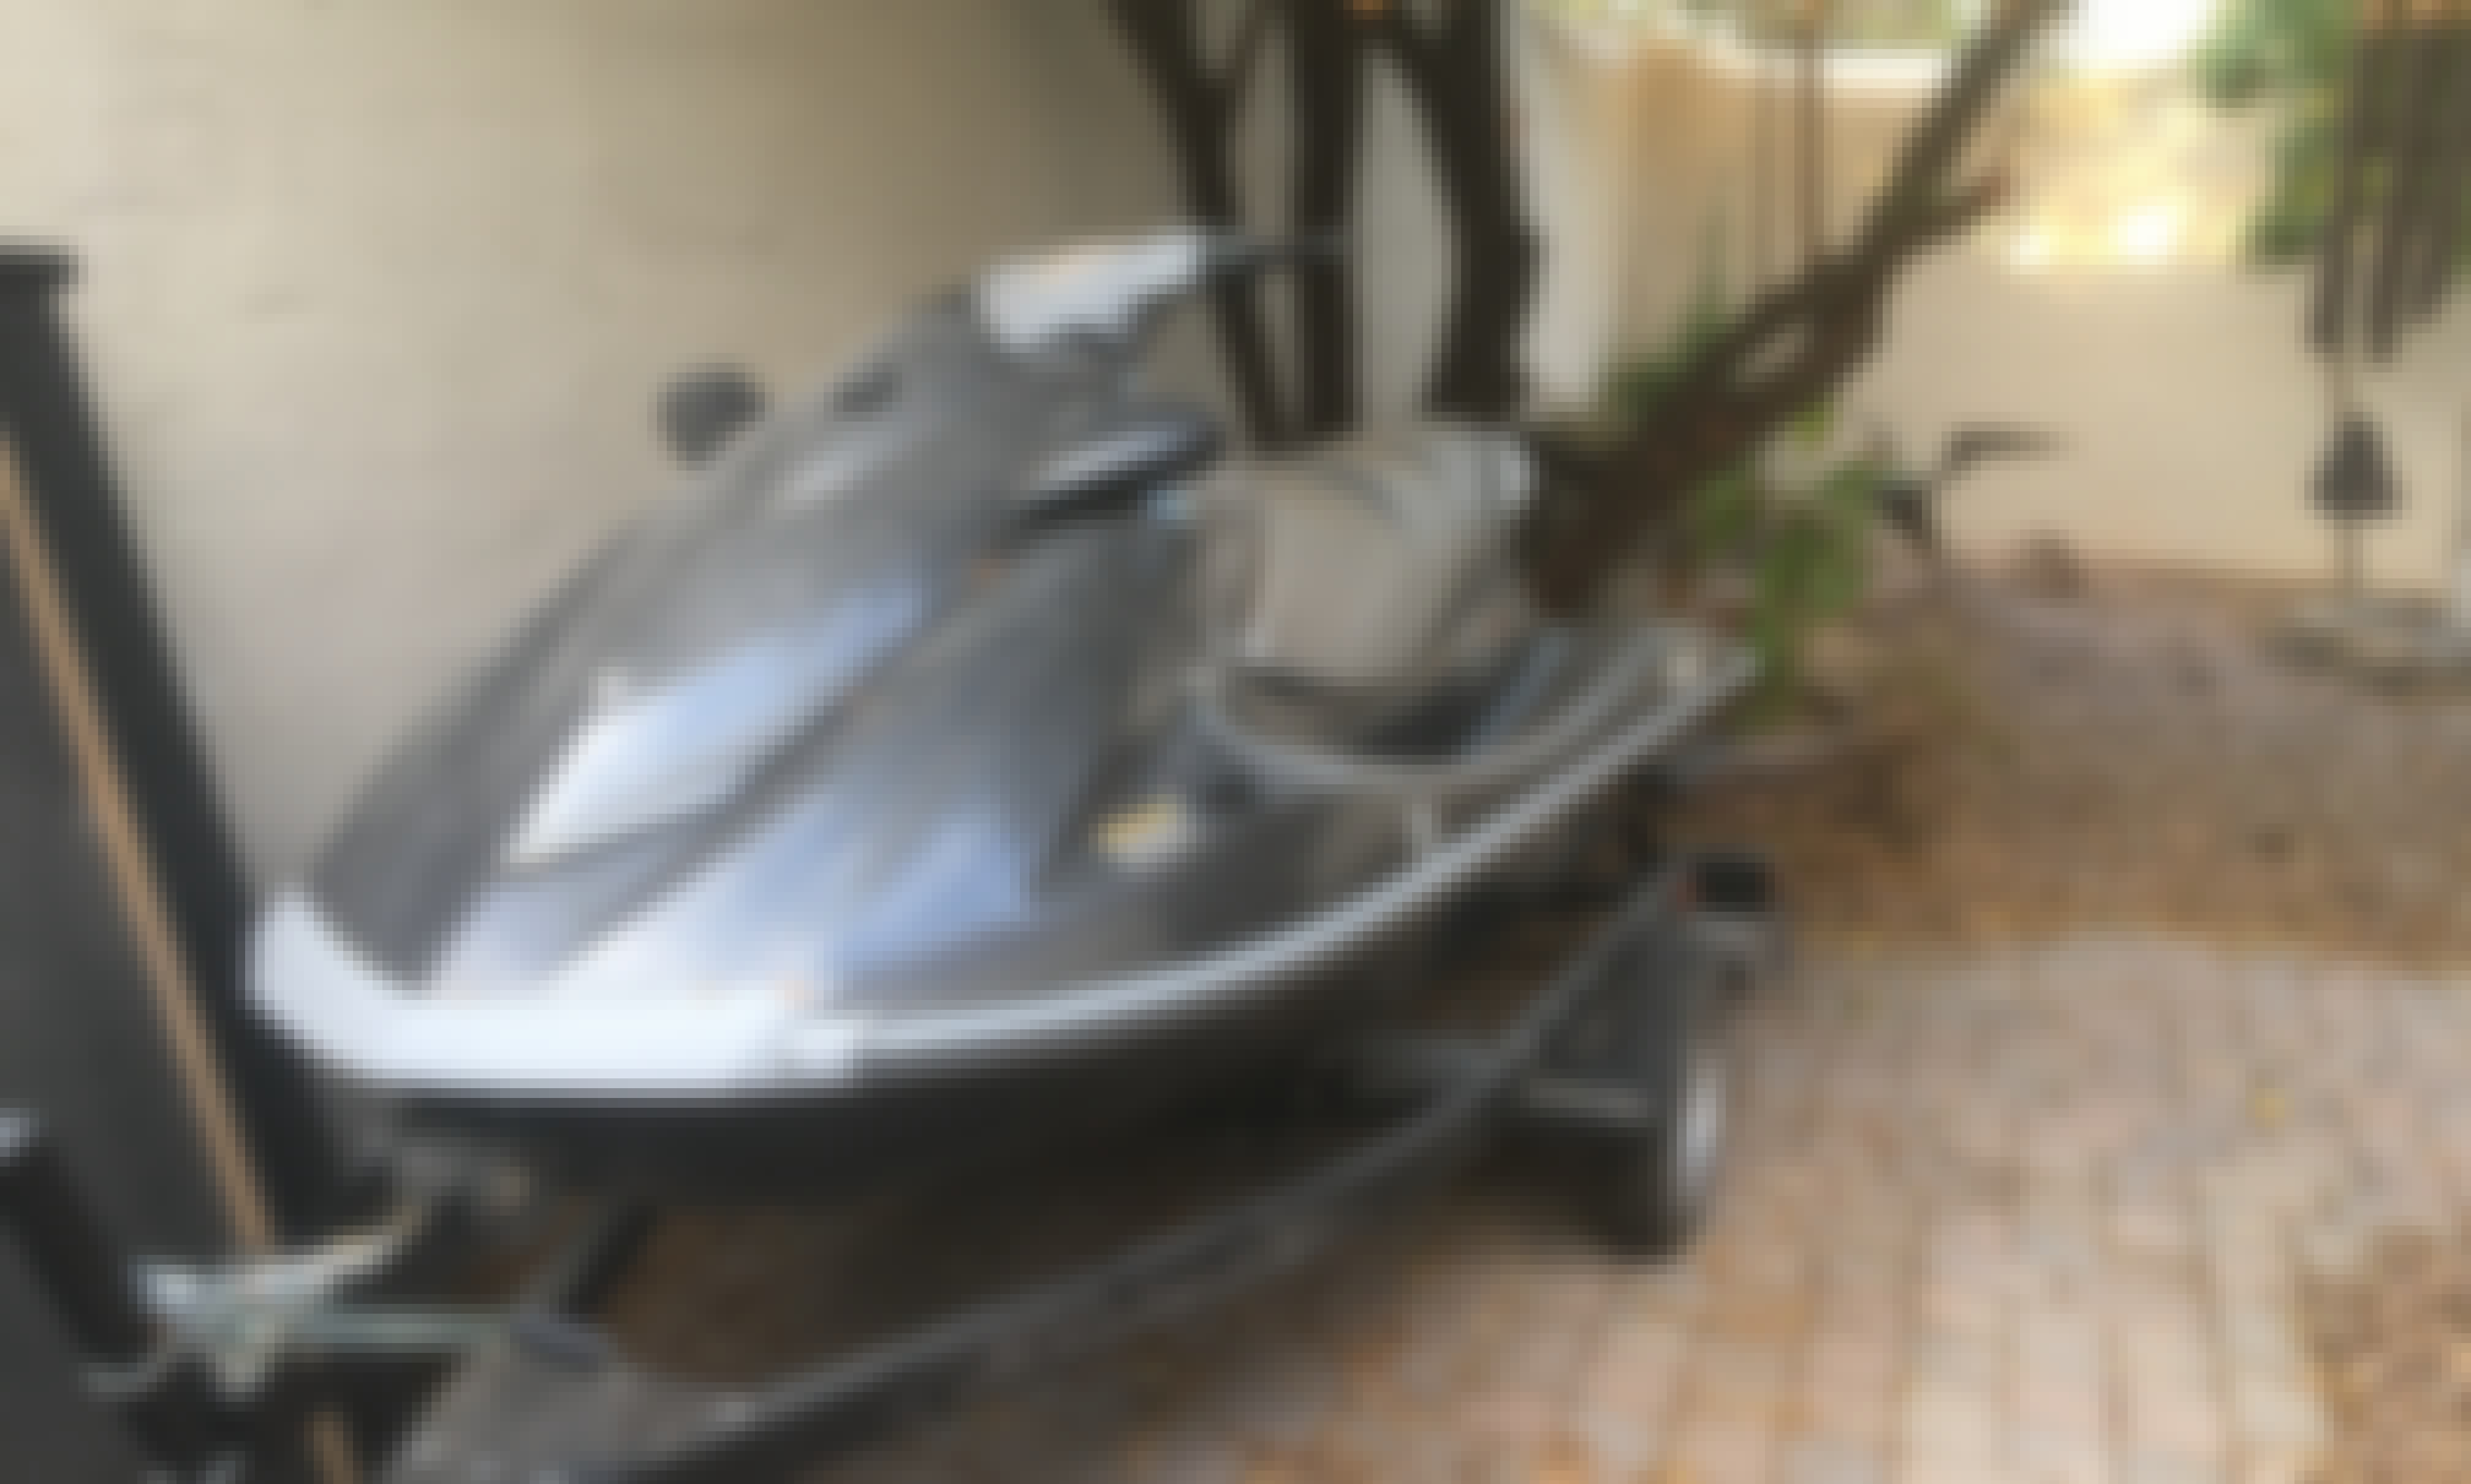 3-Person Yamaha VX Deluxe Jet Ski Rental in Tempe, AZ